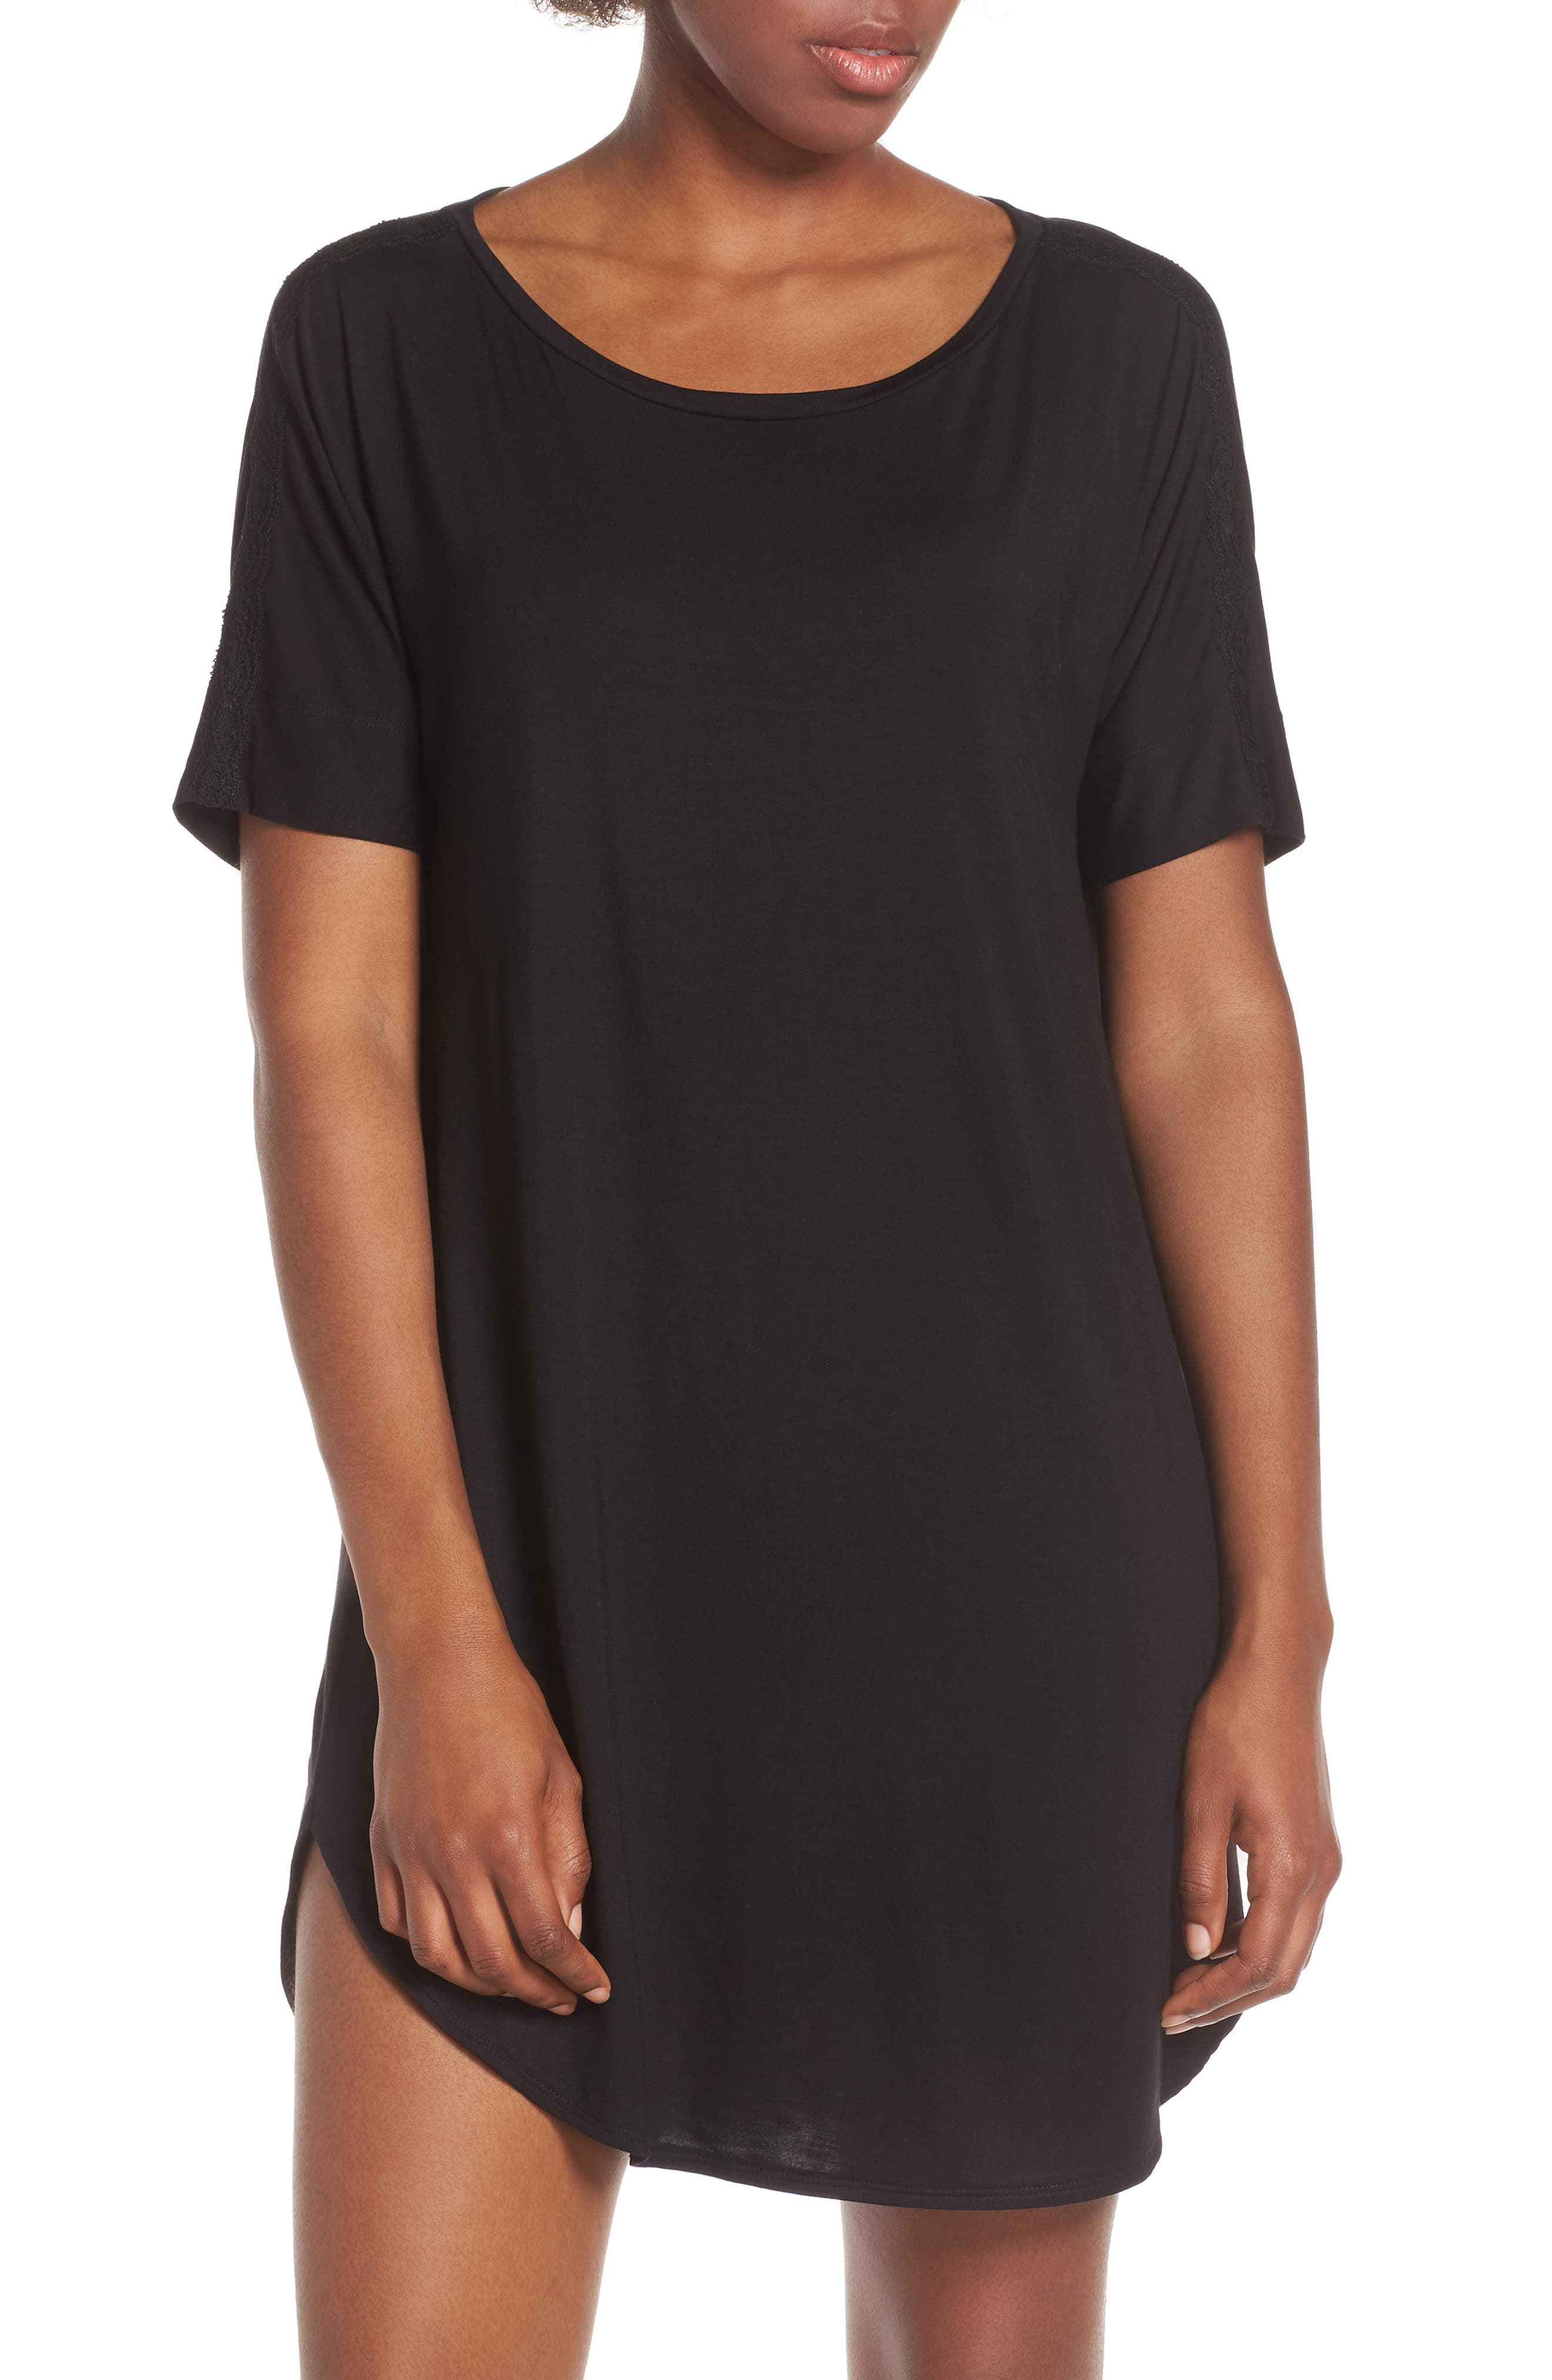 NATORI,                             Feathers Essential Sleep Shirt,                             Main thumbnail 1, color,                             BLACK